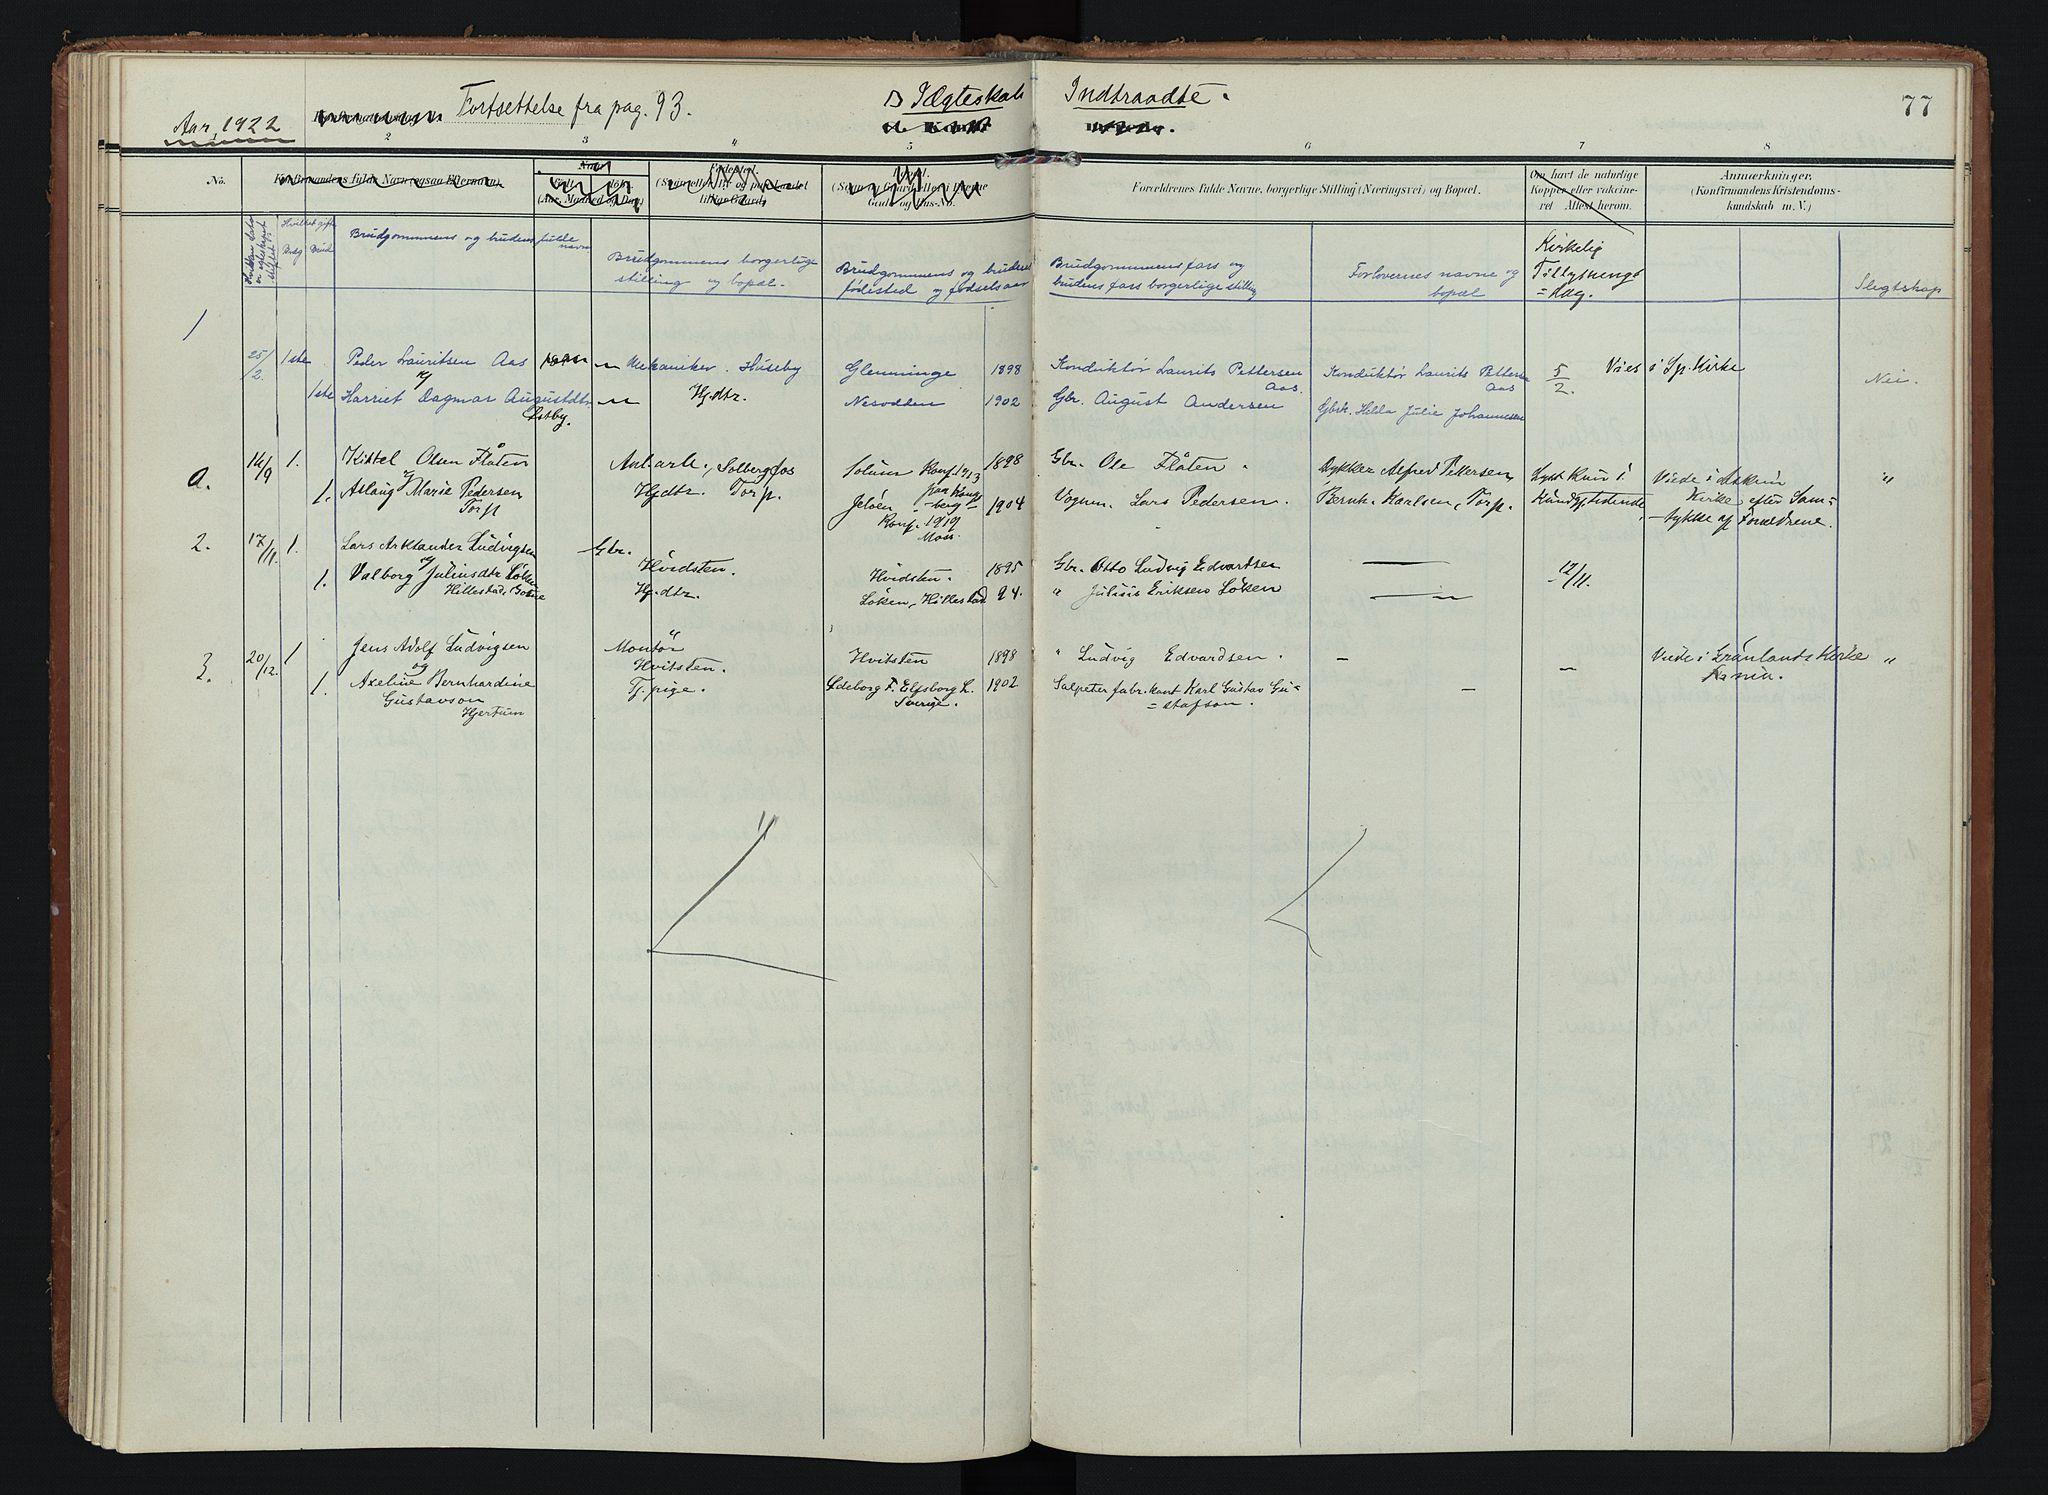 SAO, Spydeberg prestekontor Kirkebøker, F/Fb/L0002: Ministerialbok nr. II 2, 1908-1926, s. 77